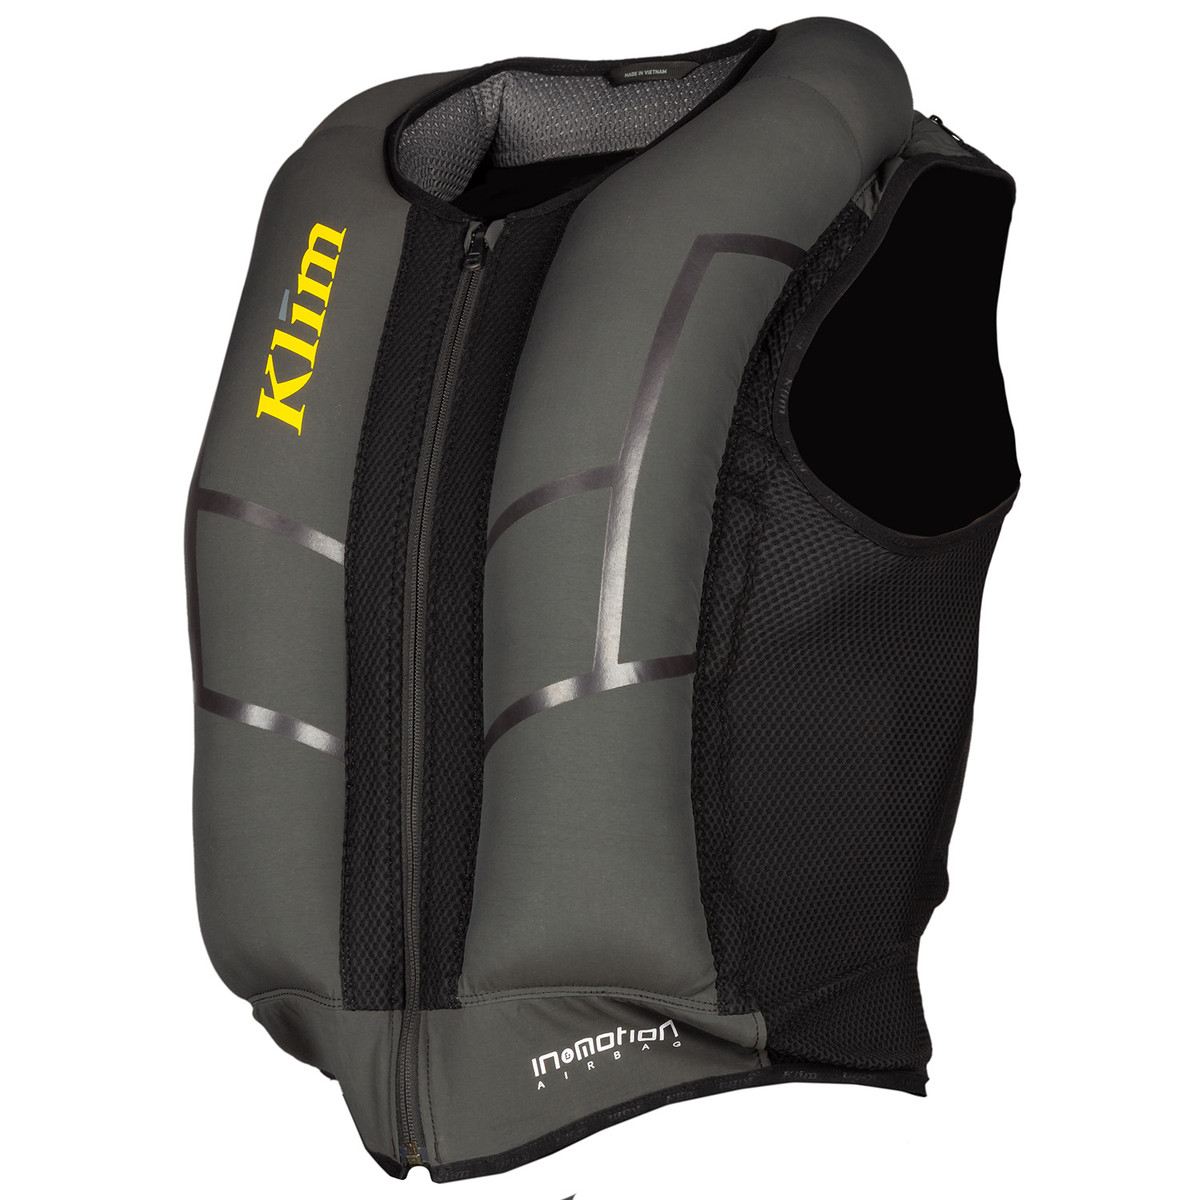 Klim Ai-1 Motocycle Airbag Vest